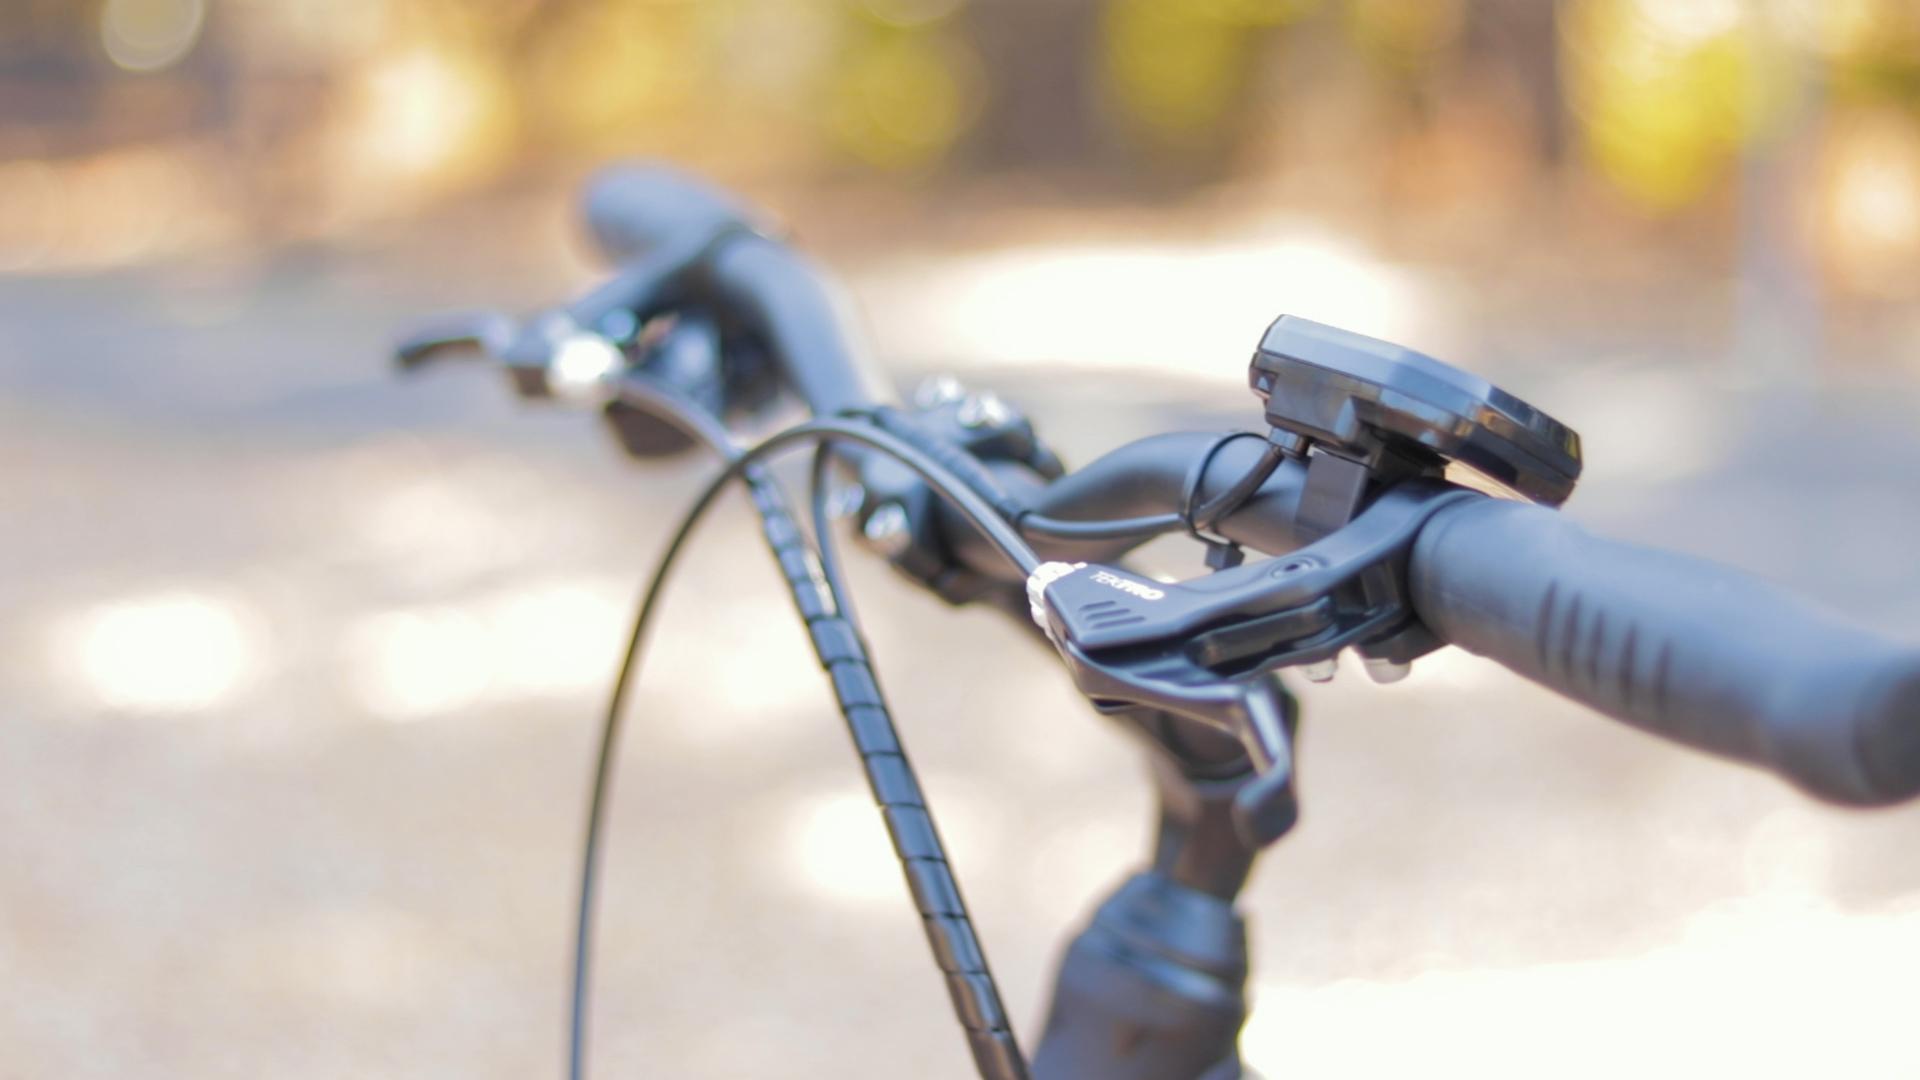 electrified-reviews-izip-e3-brio-electric-bike-review-handelbars.jpg